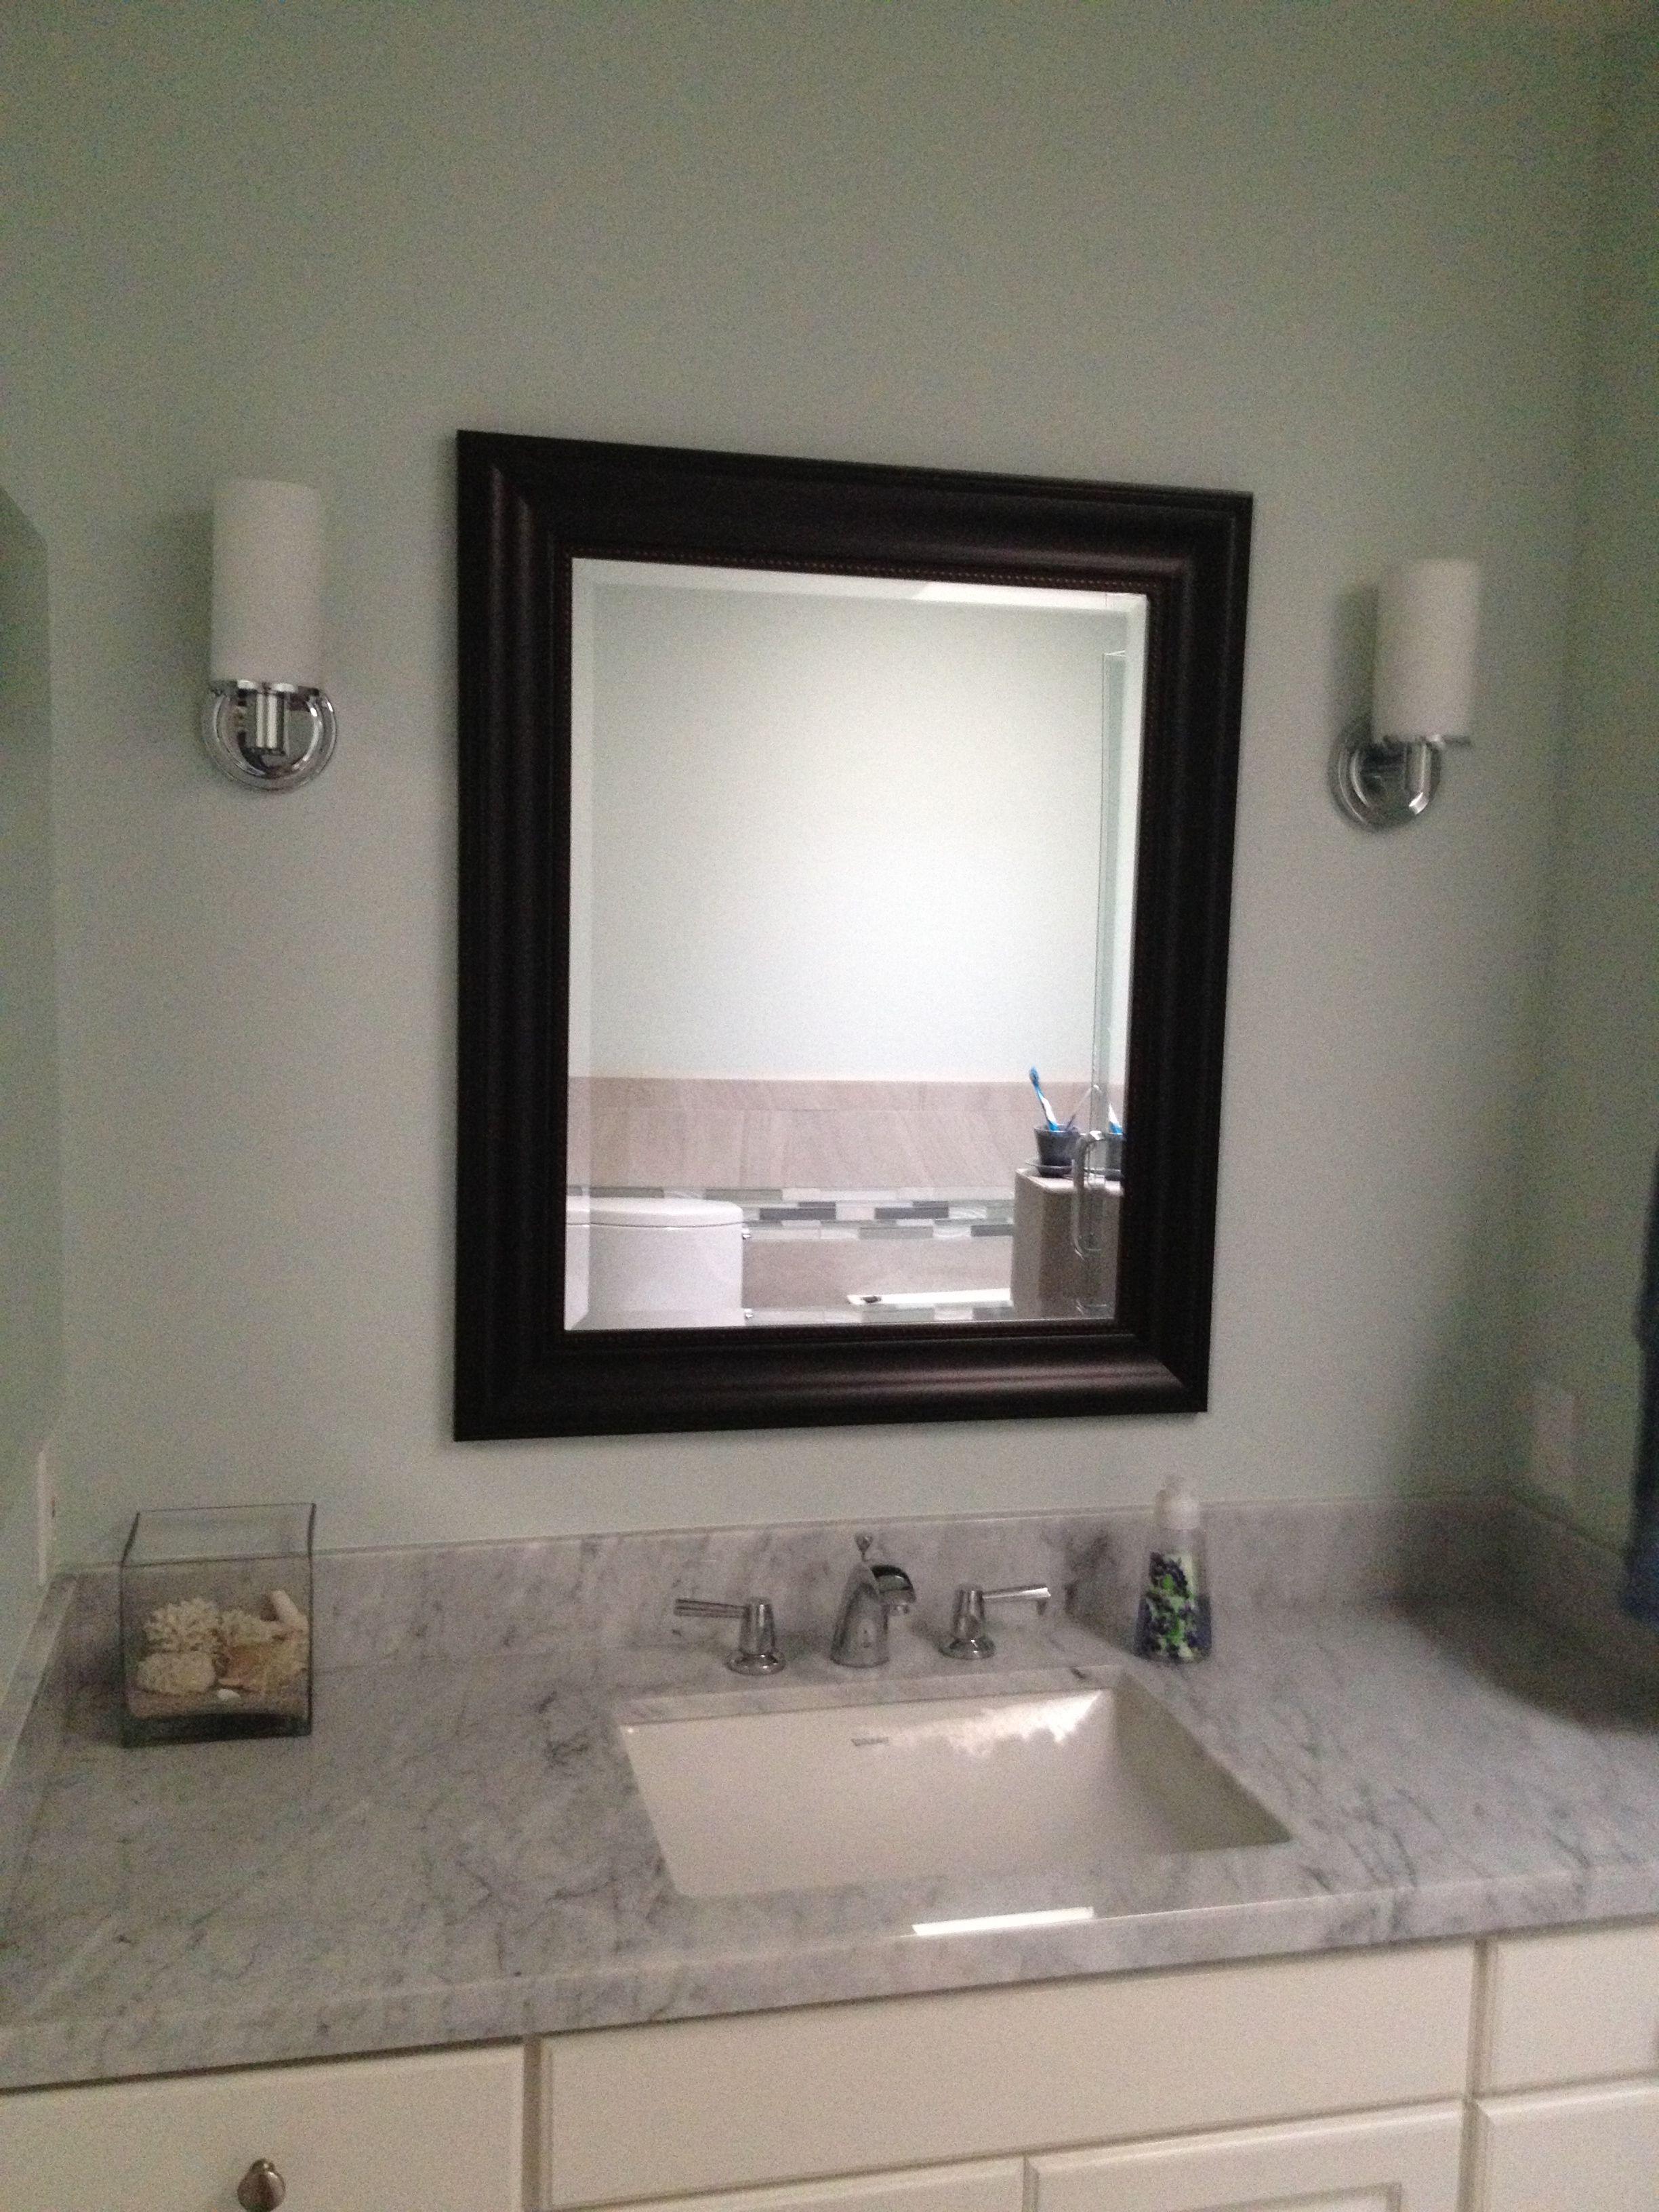 benjamin moore green tint paint color bathroom remodel in 2019 rh pinterest com